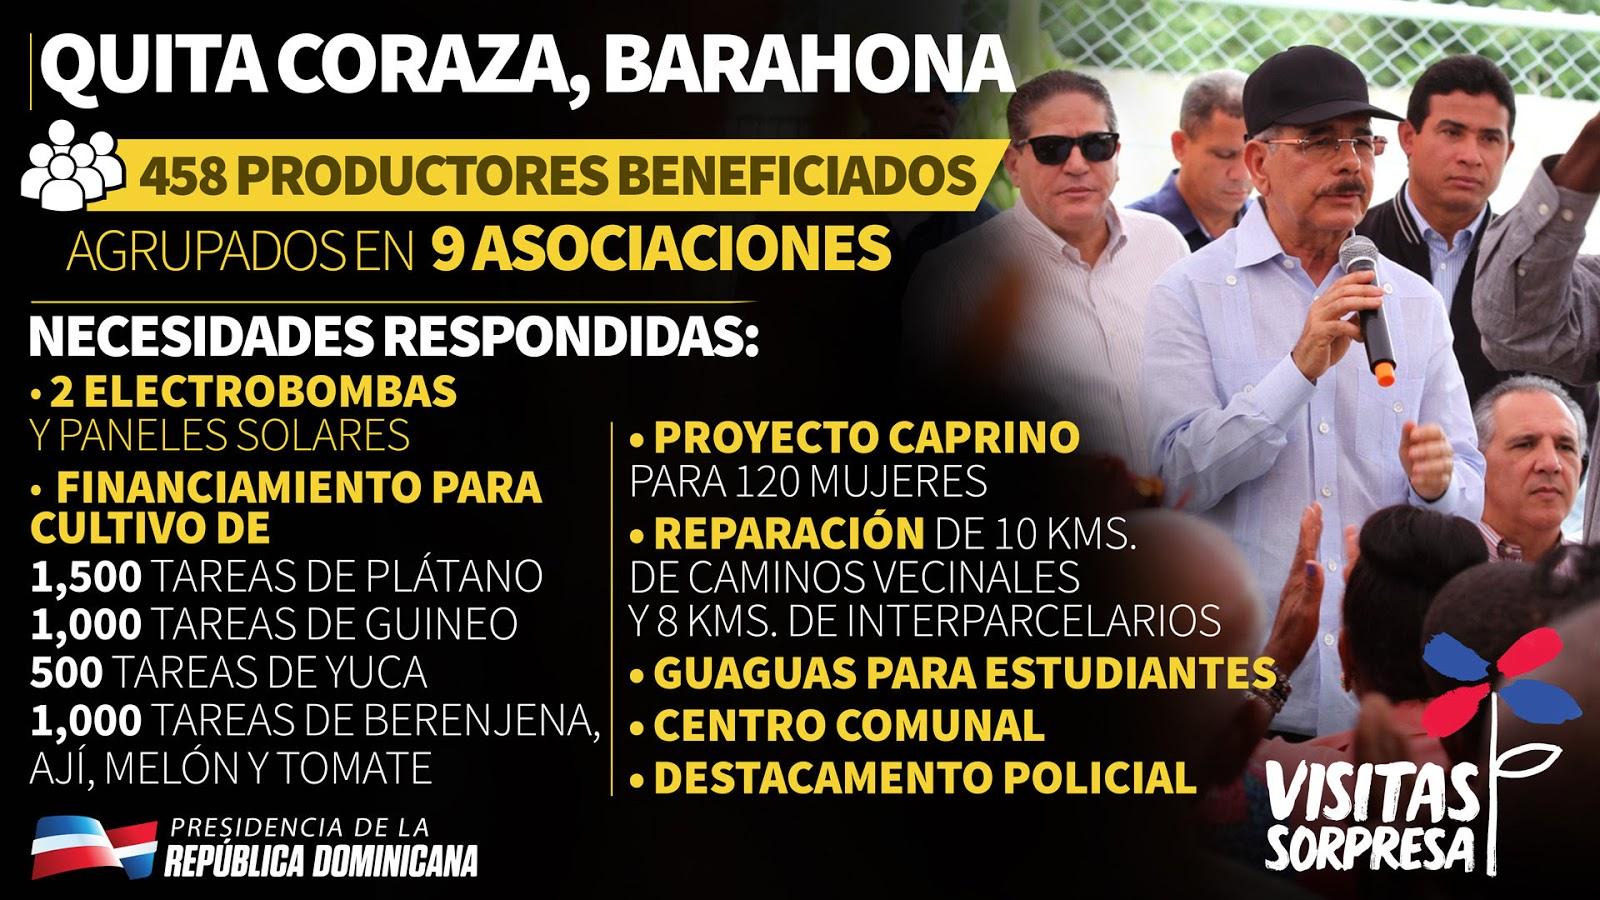 Quita Coraza, Barahona.  458 productores beneficiados. Infografía